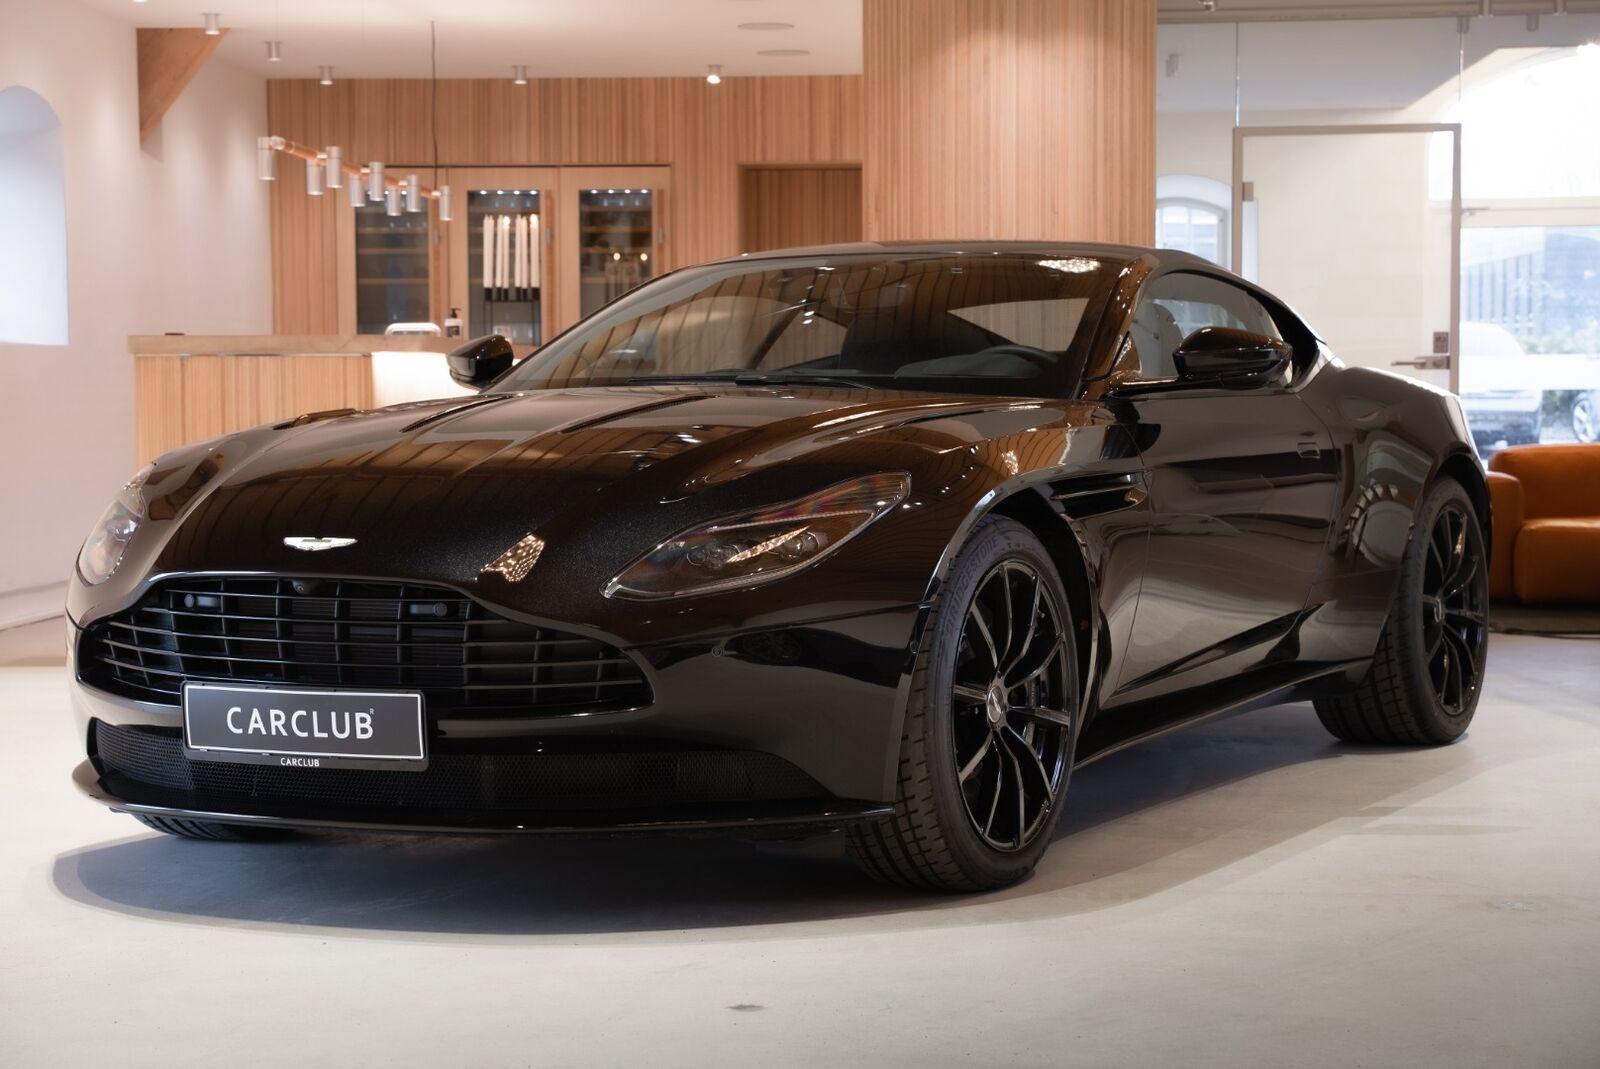 Aston Martin DB11 5,2 V12 Coupé AMR aut. 2d - 0 kr.